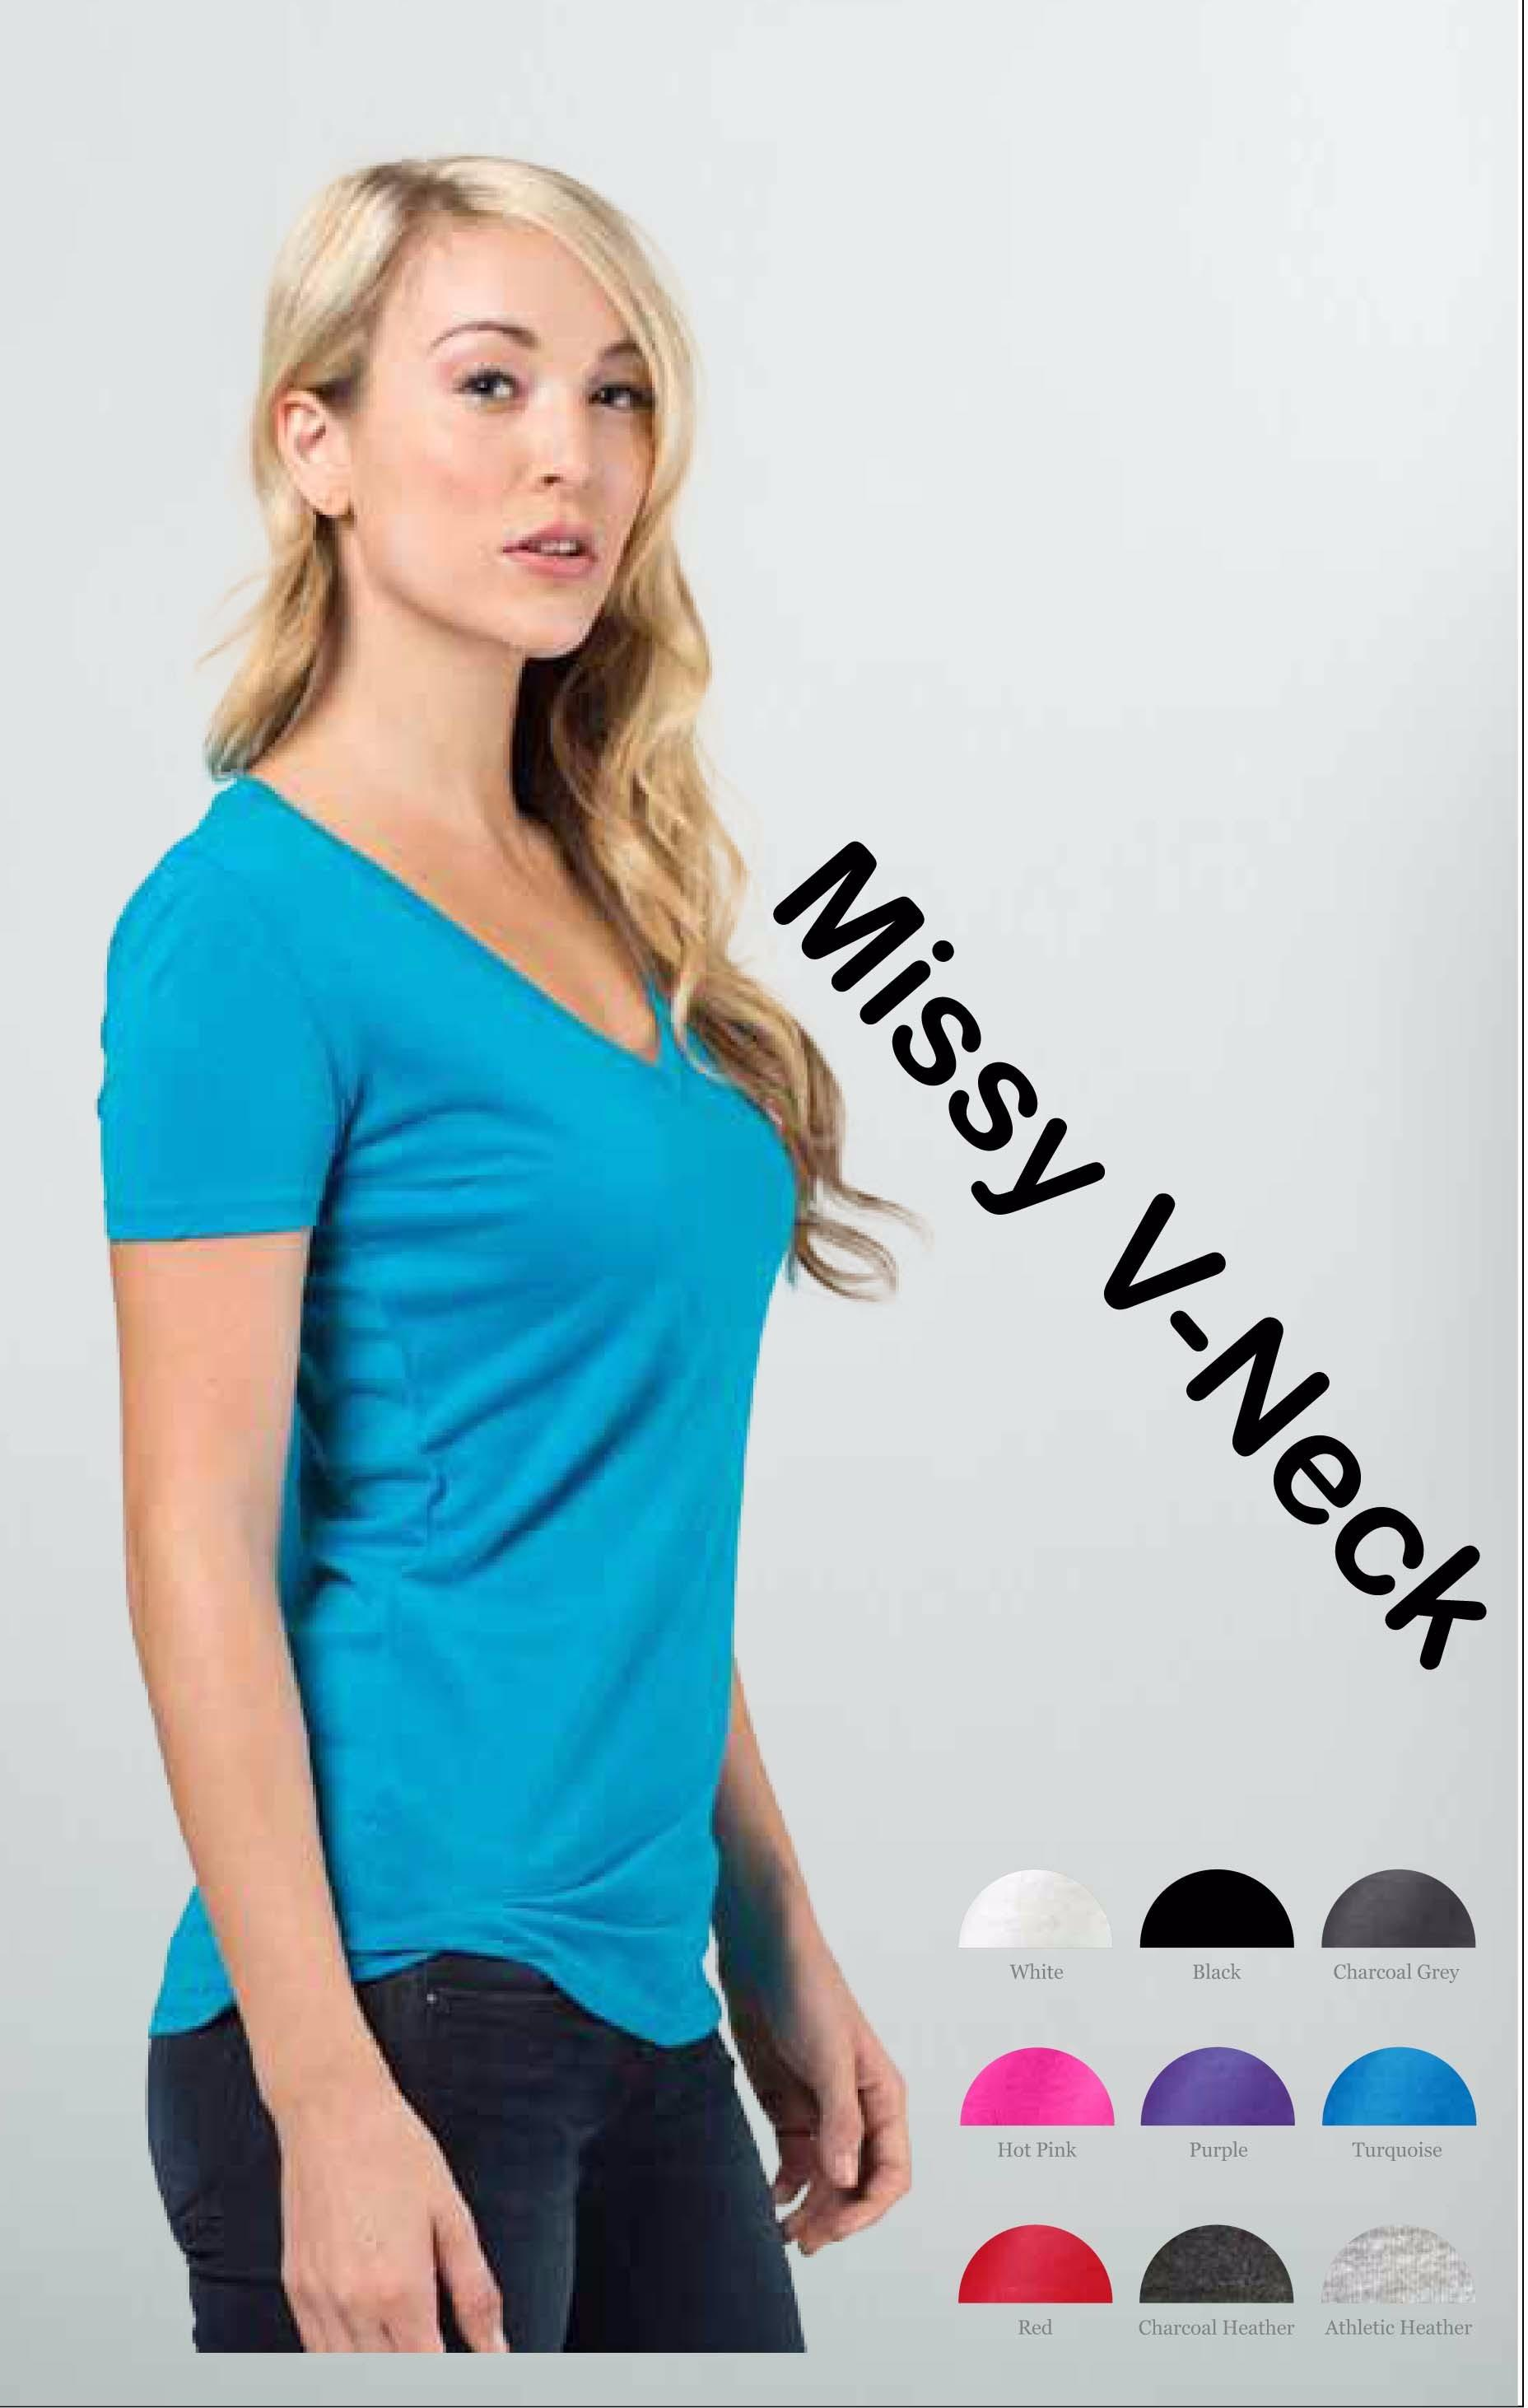 wholesale t shirts N image 9